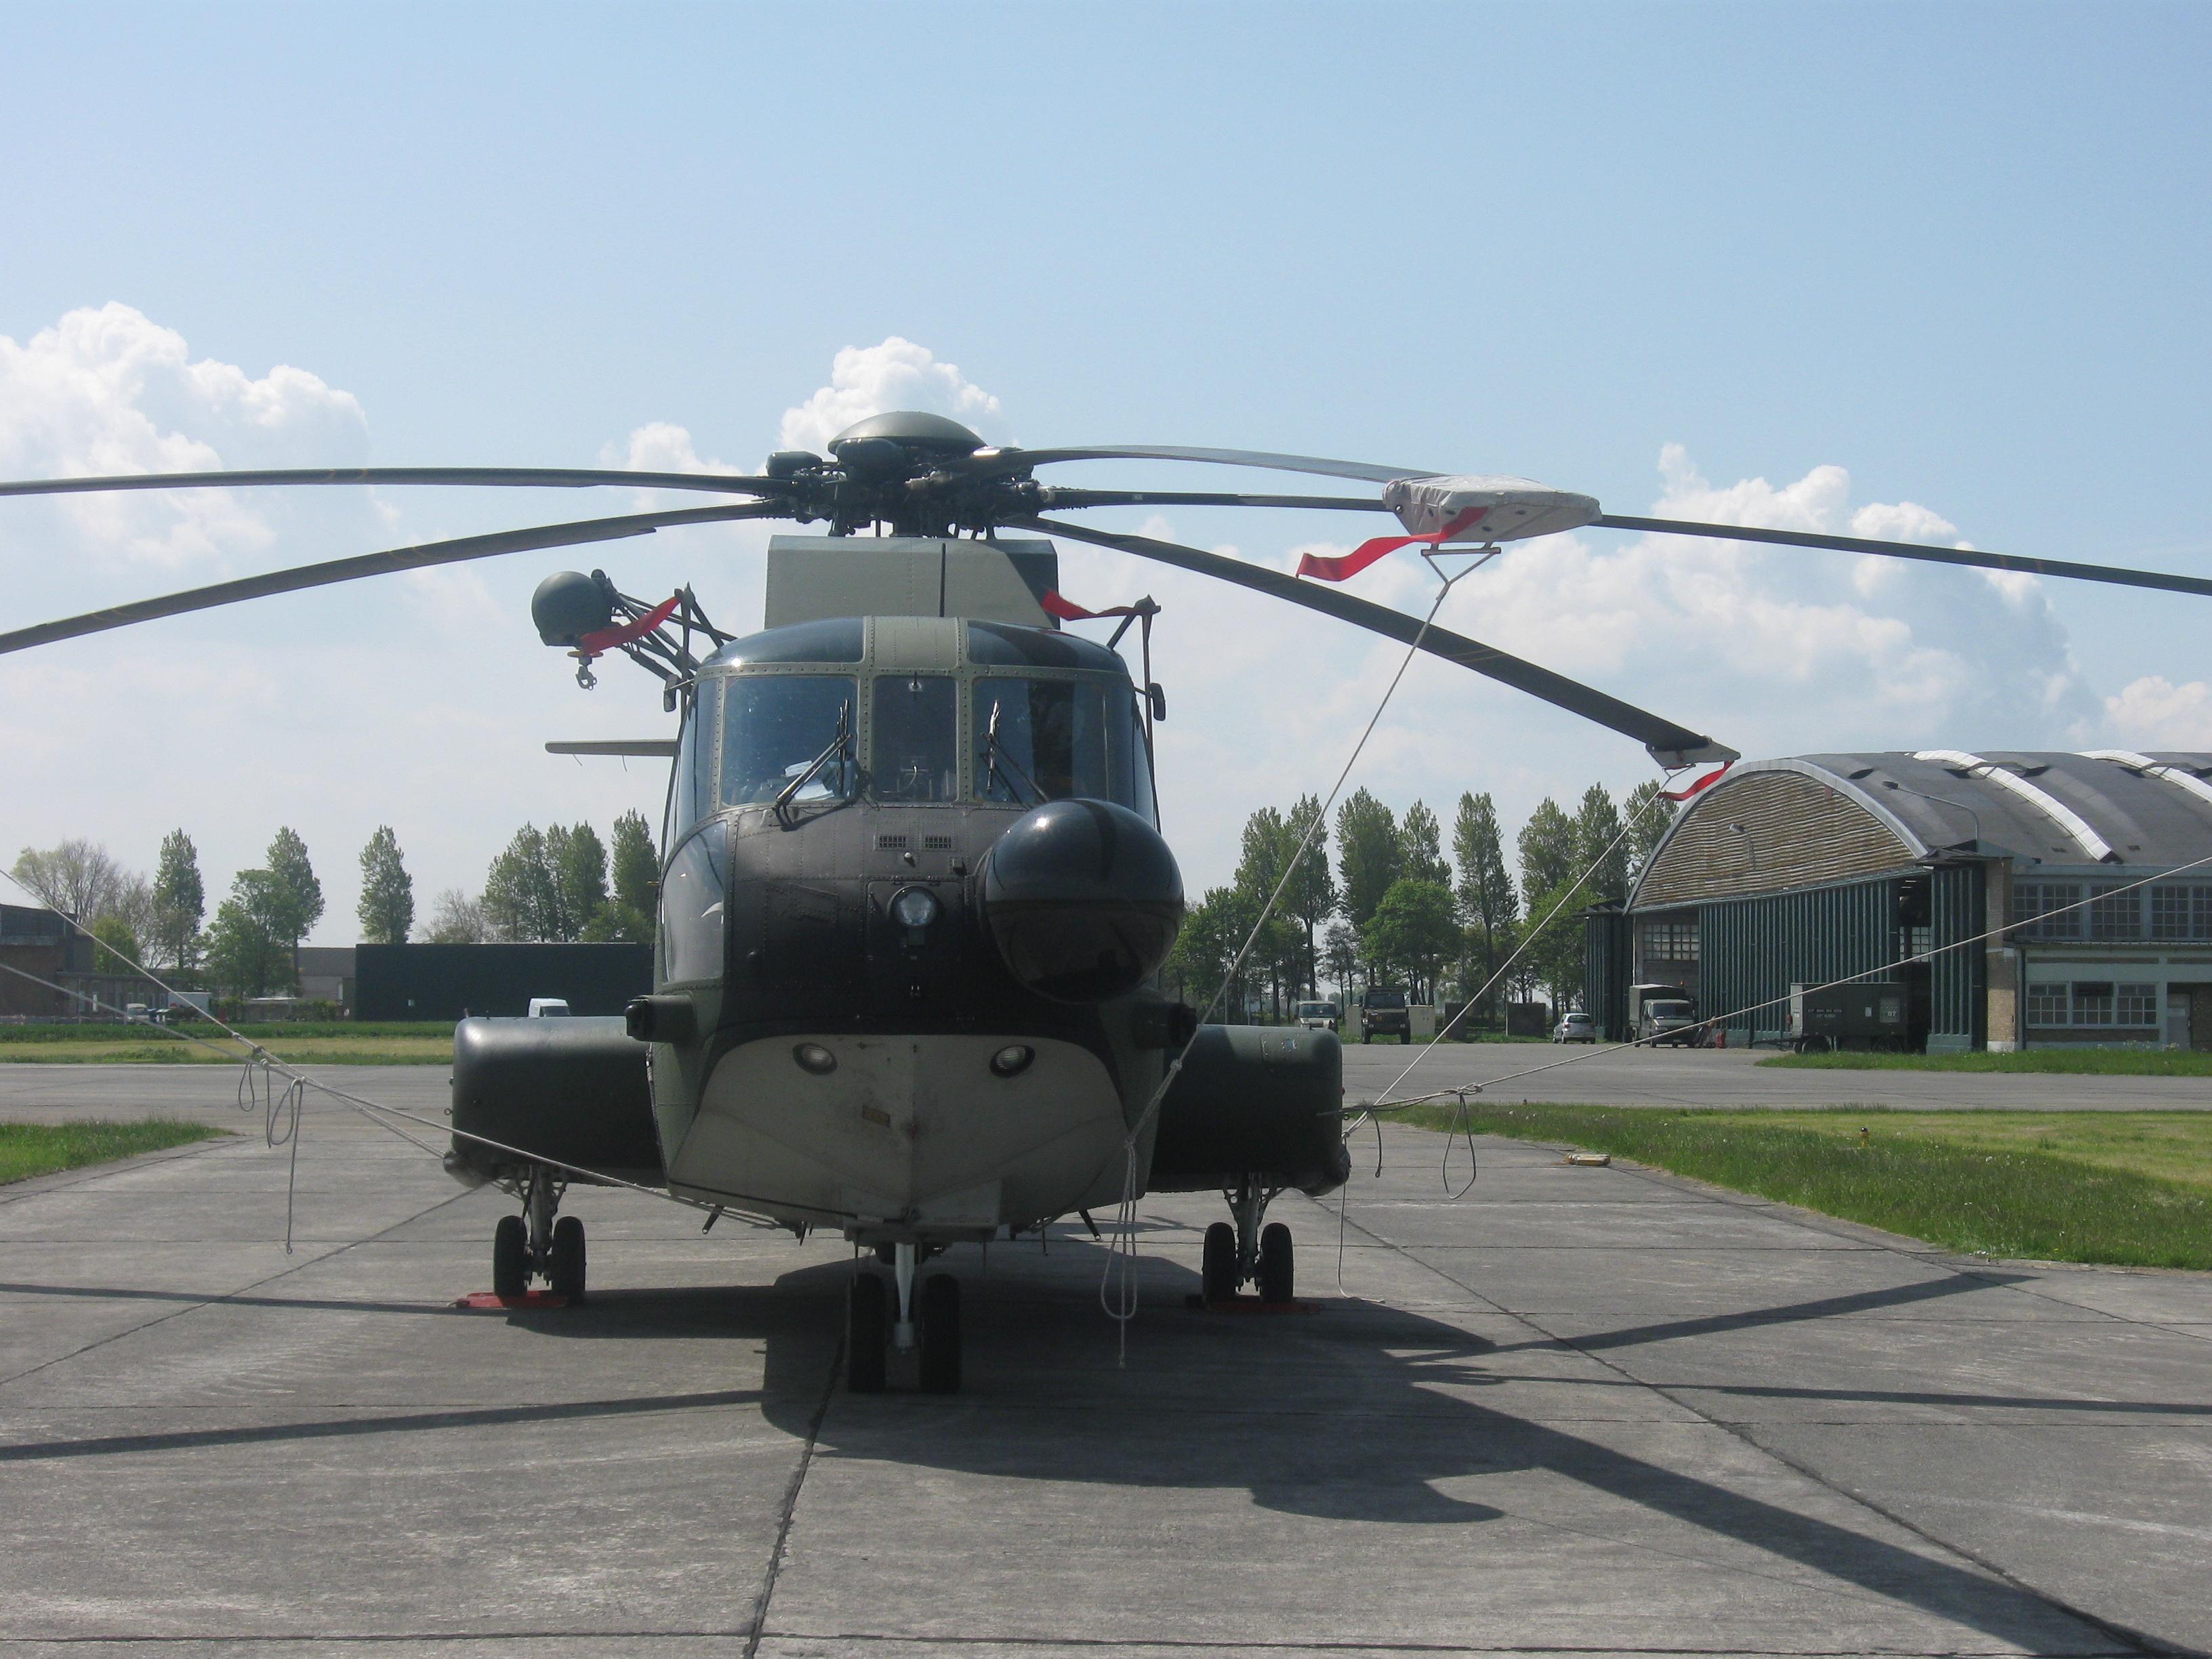 Helico's : divers, photos, infos 1005180812021050246058955